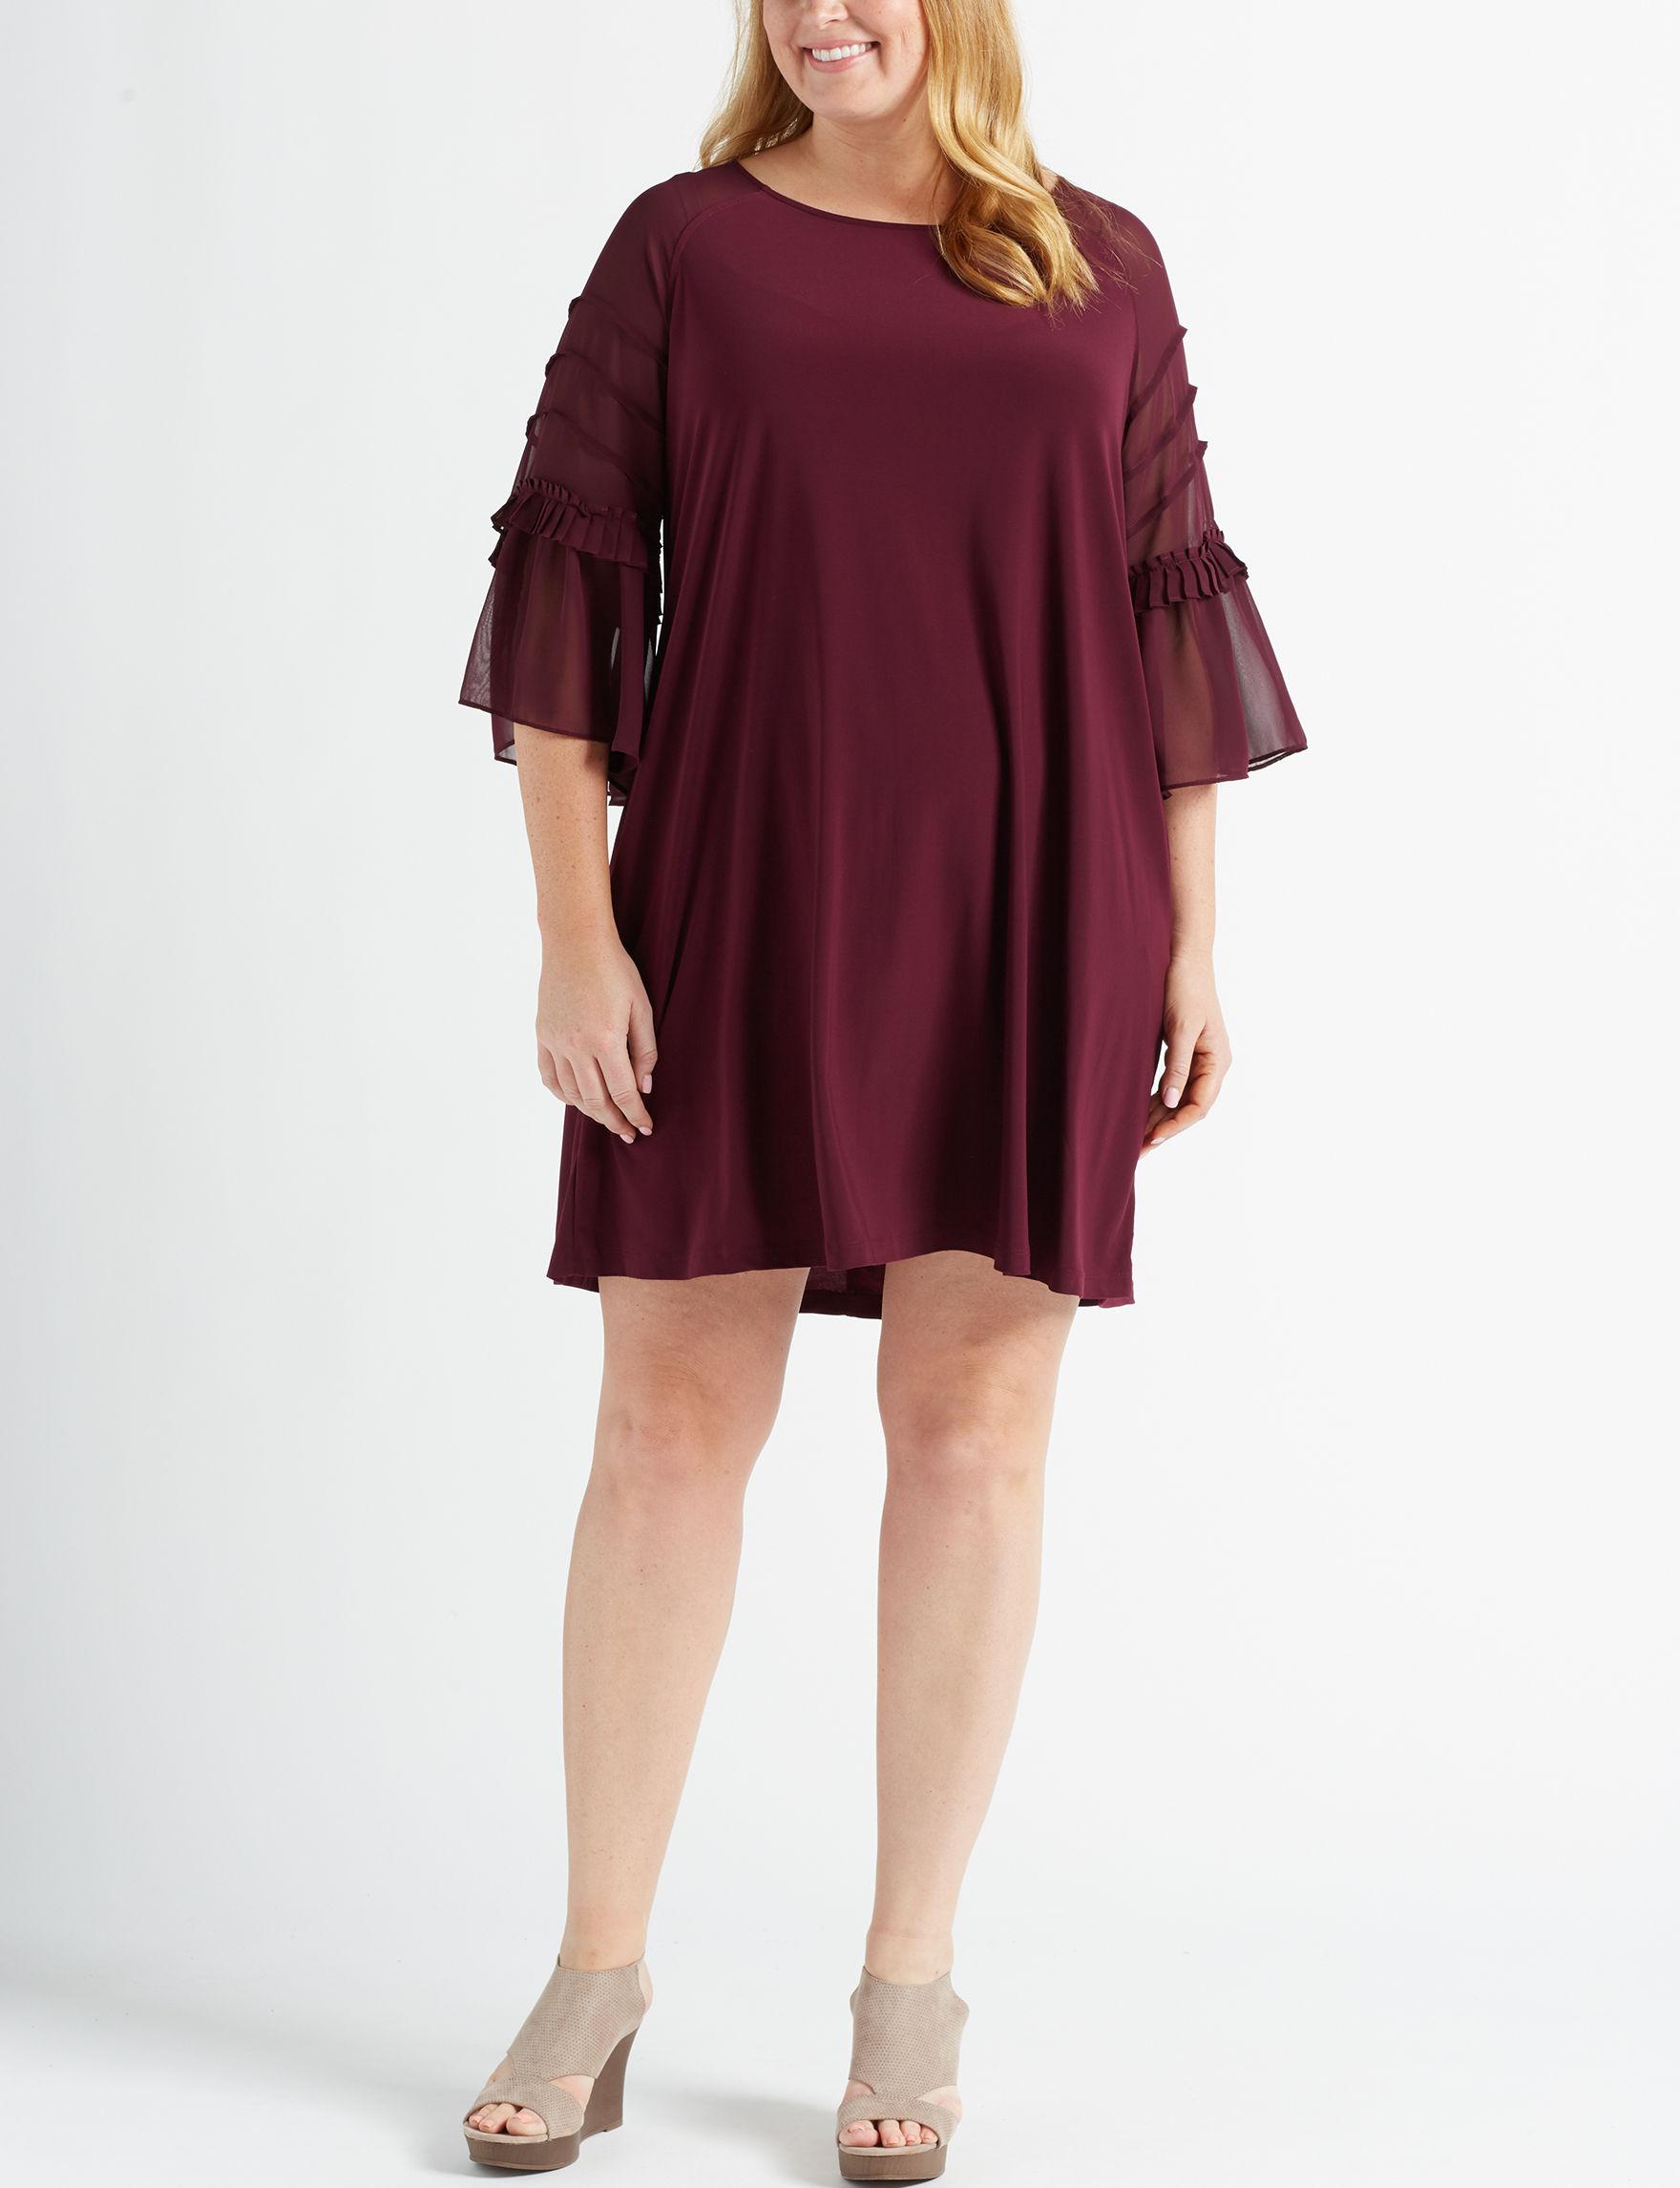 Nina Leonard Wine Everyday & Casual Shift Dresses